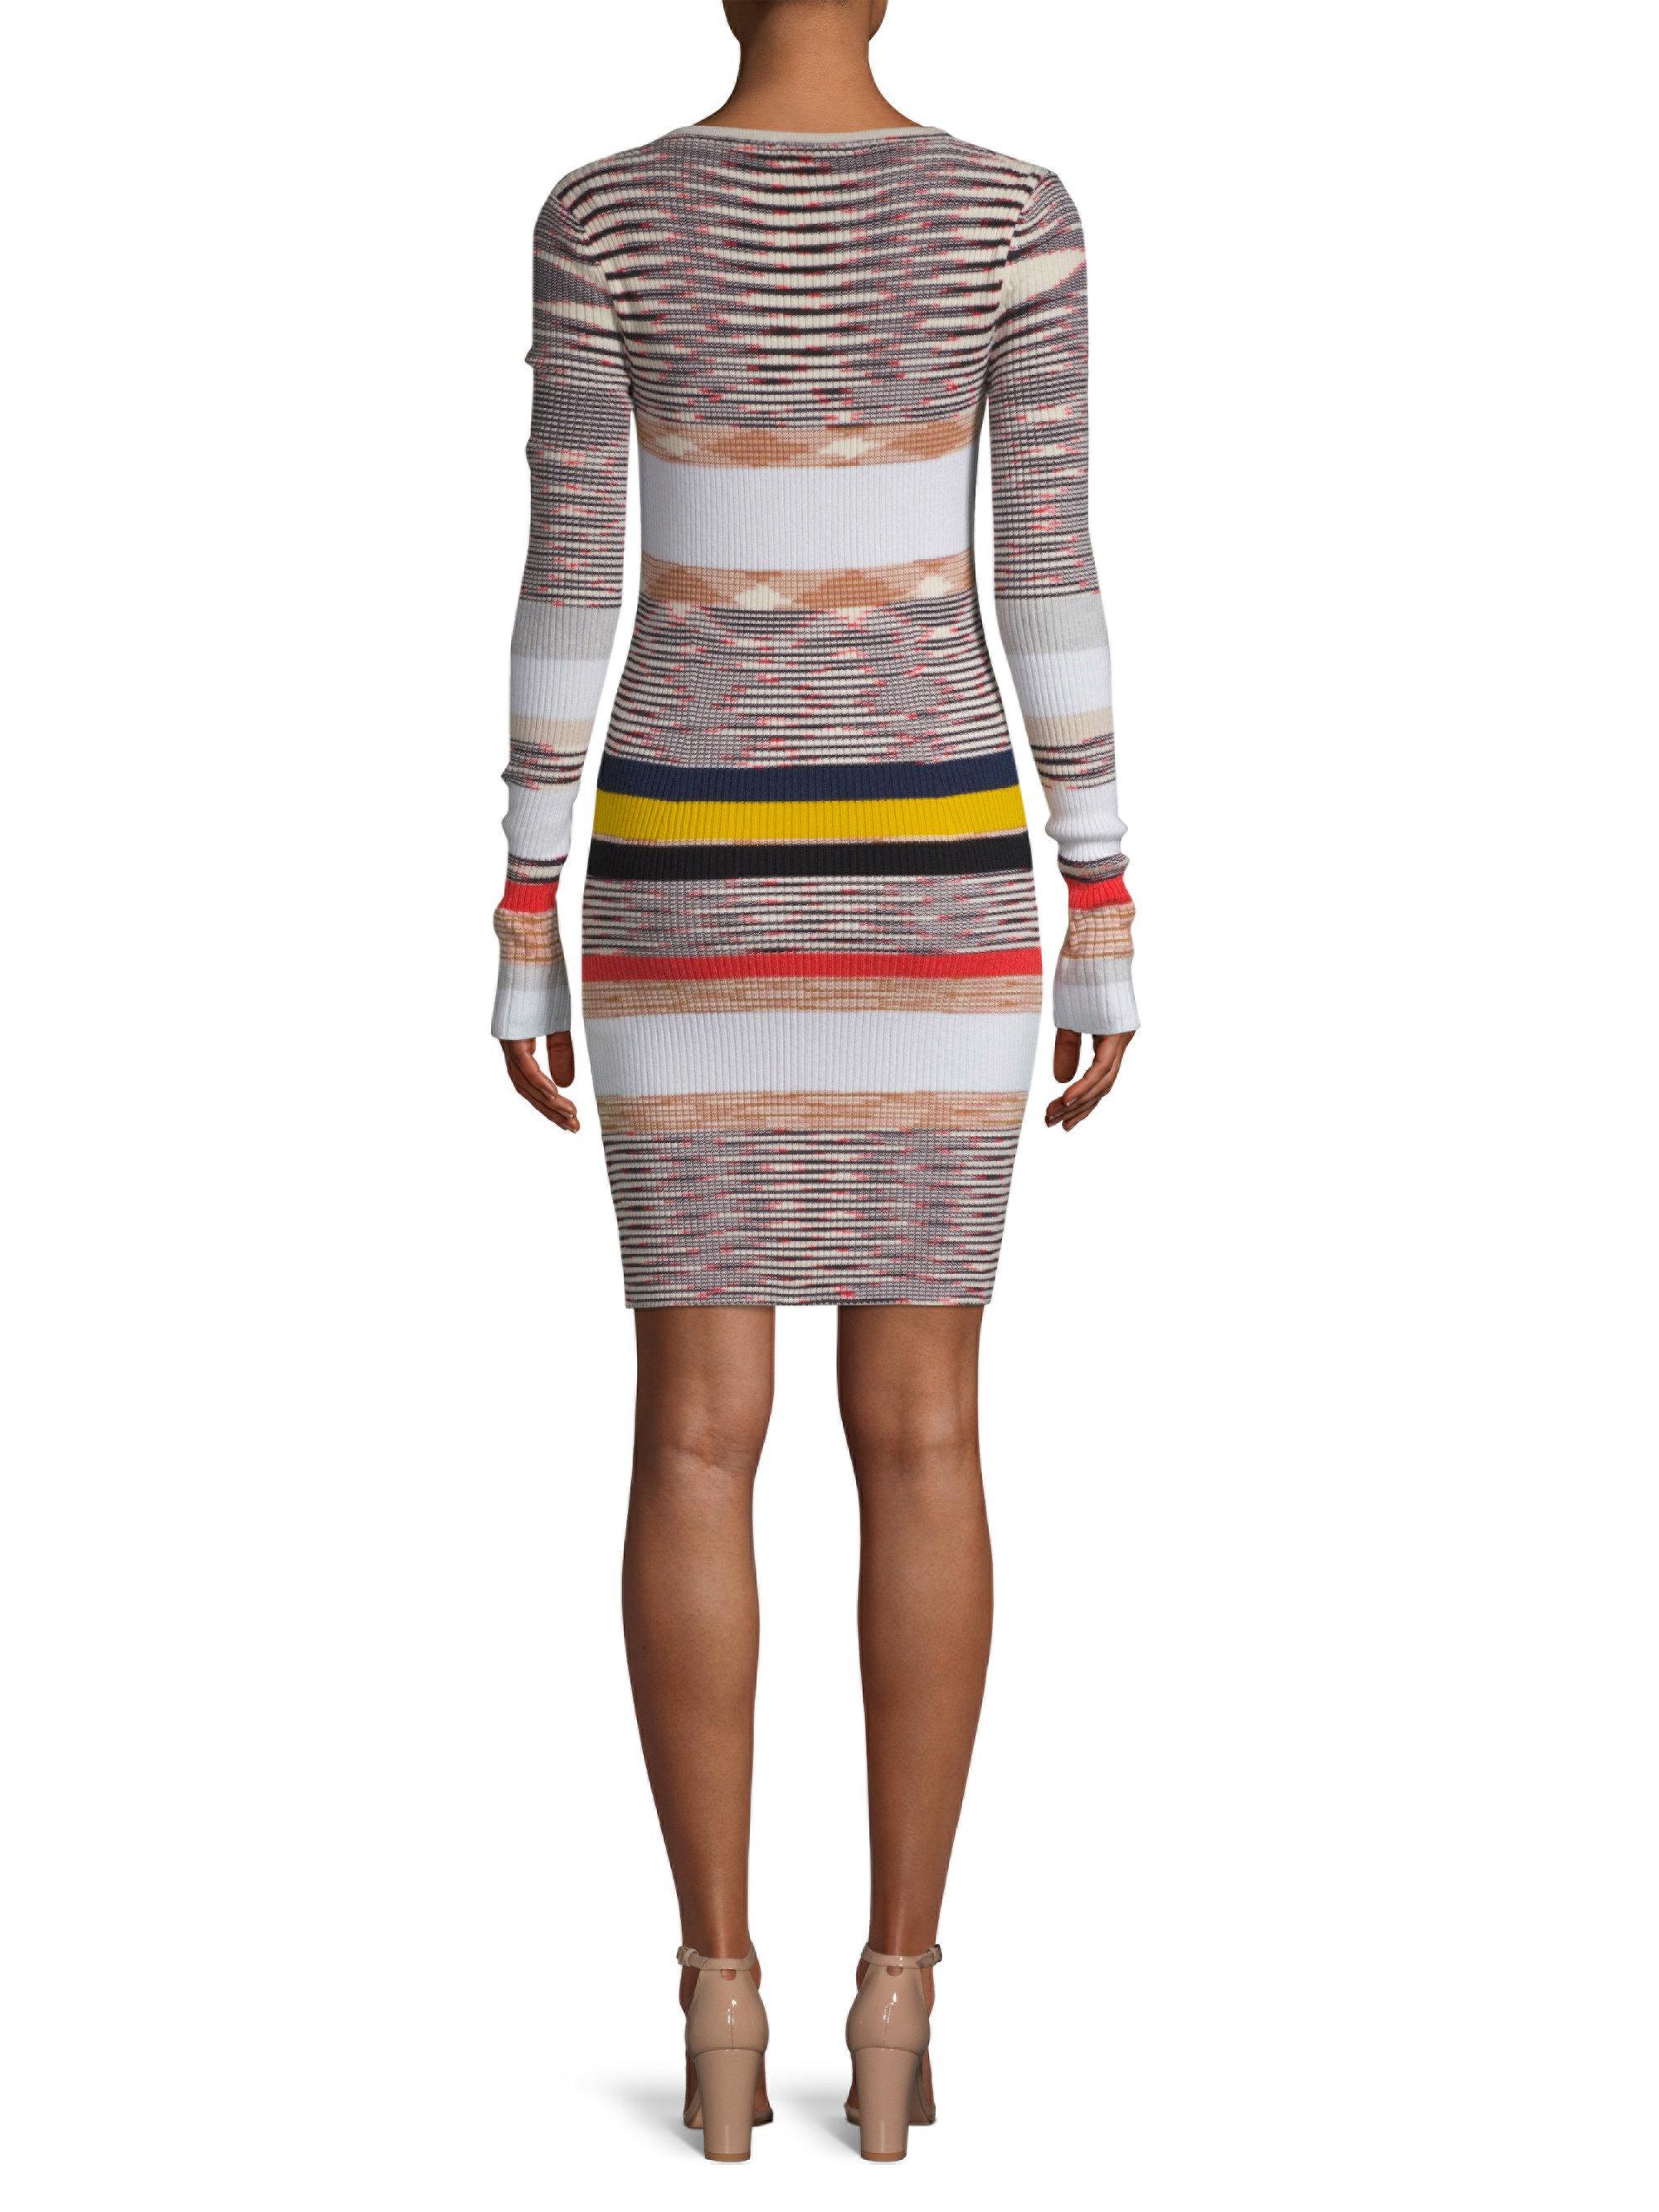 Missoni Multicolor Cashmere Striped Sweater Dress Lyst View Fullscreen